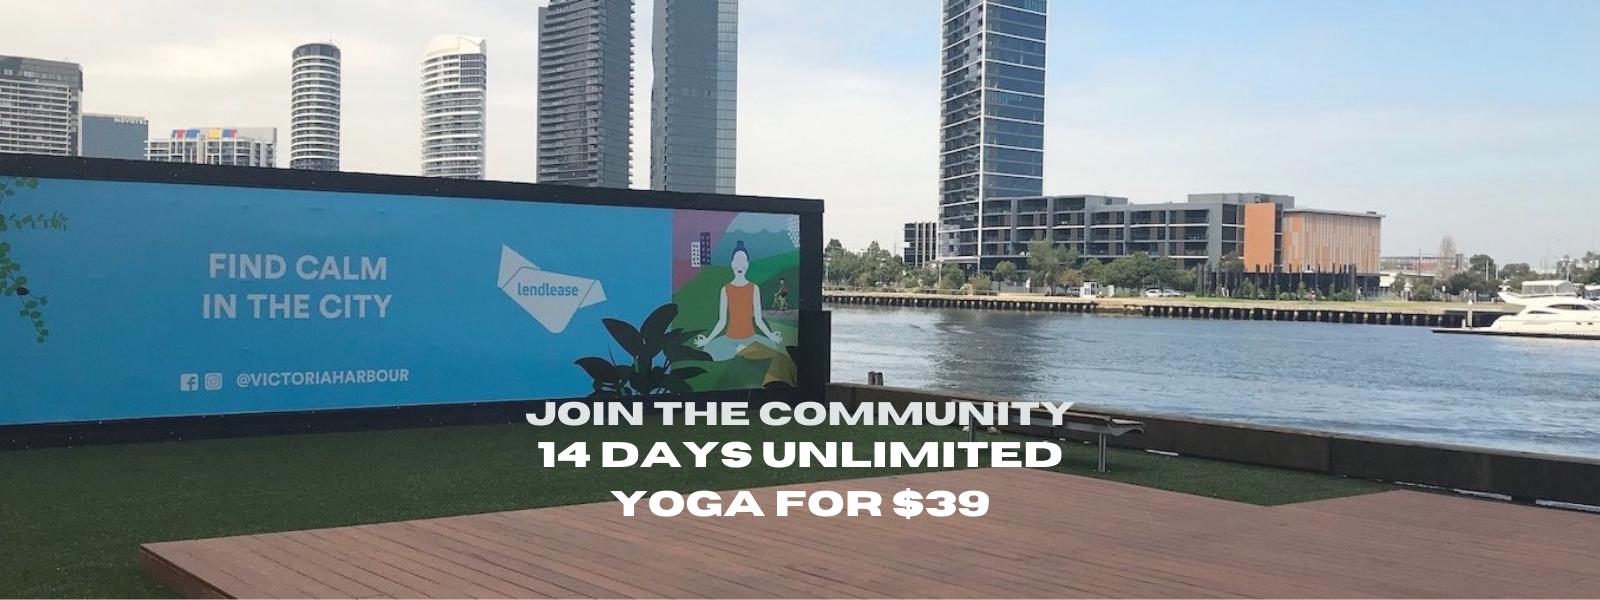 Yoga Studio Docklands